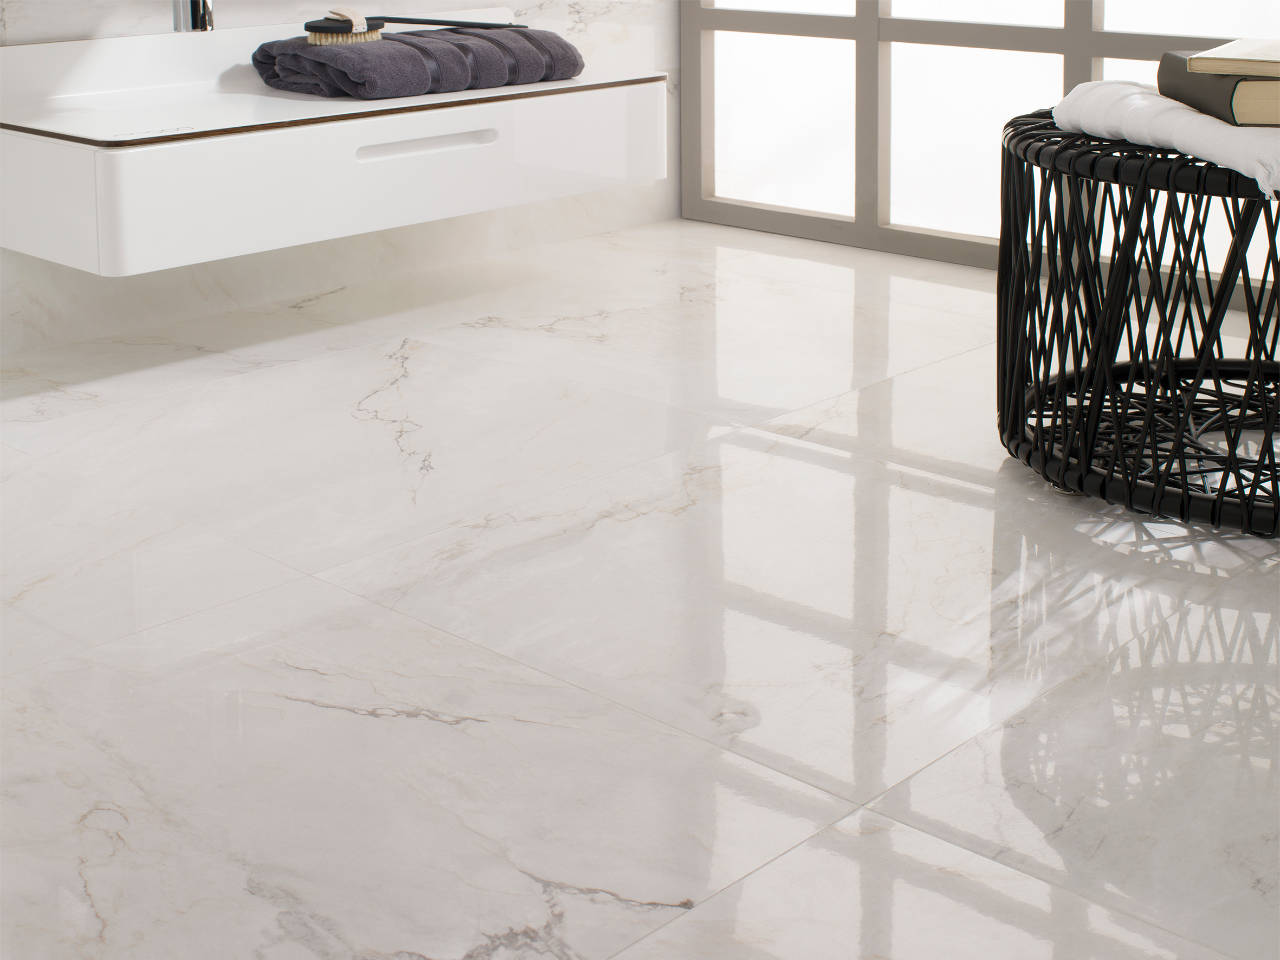 Pavimento flottante prezzi finto pavimento trendy pvc per interni